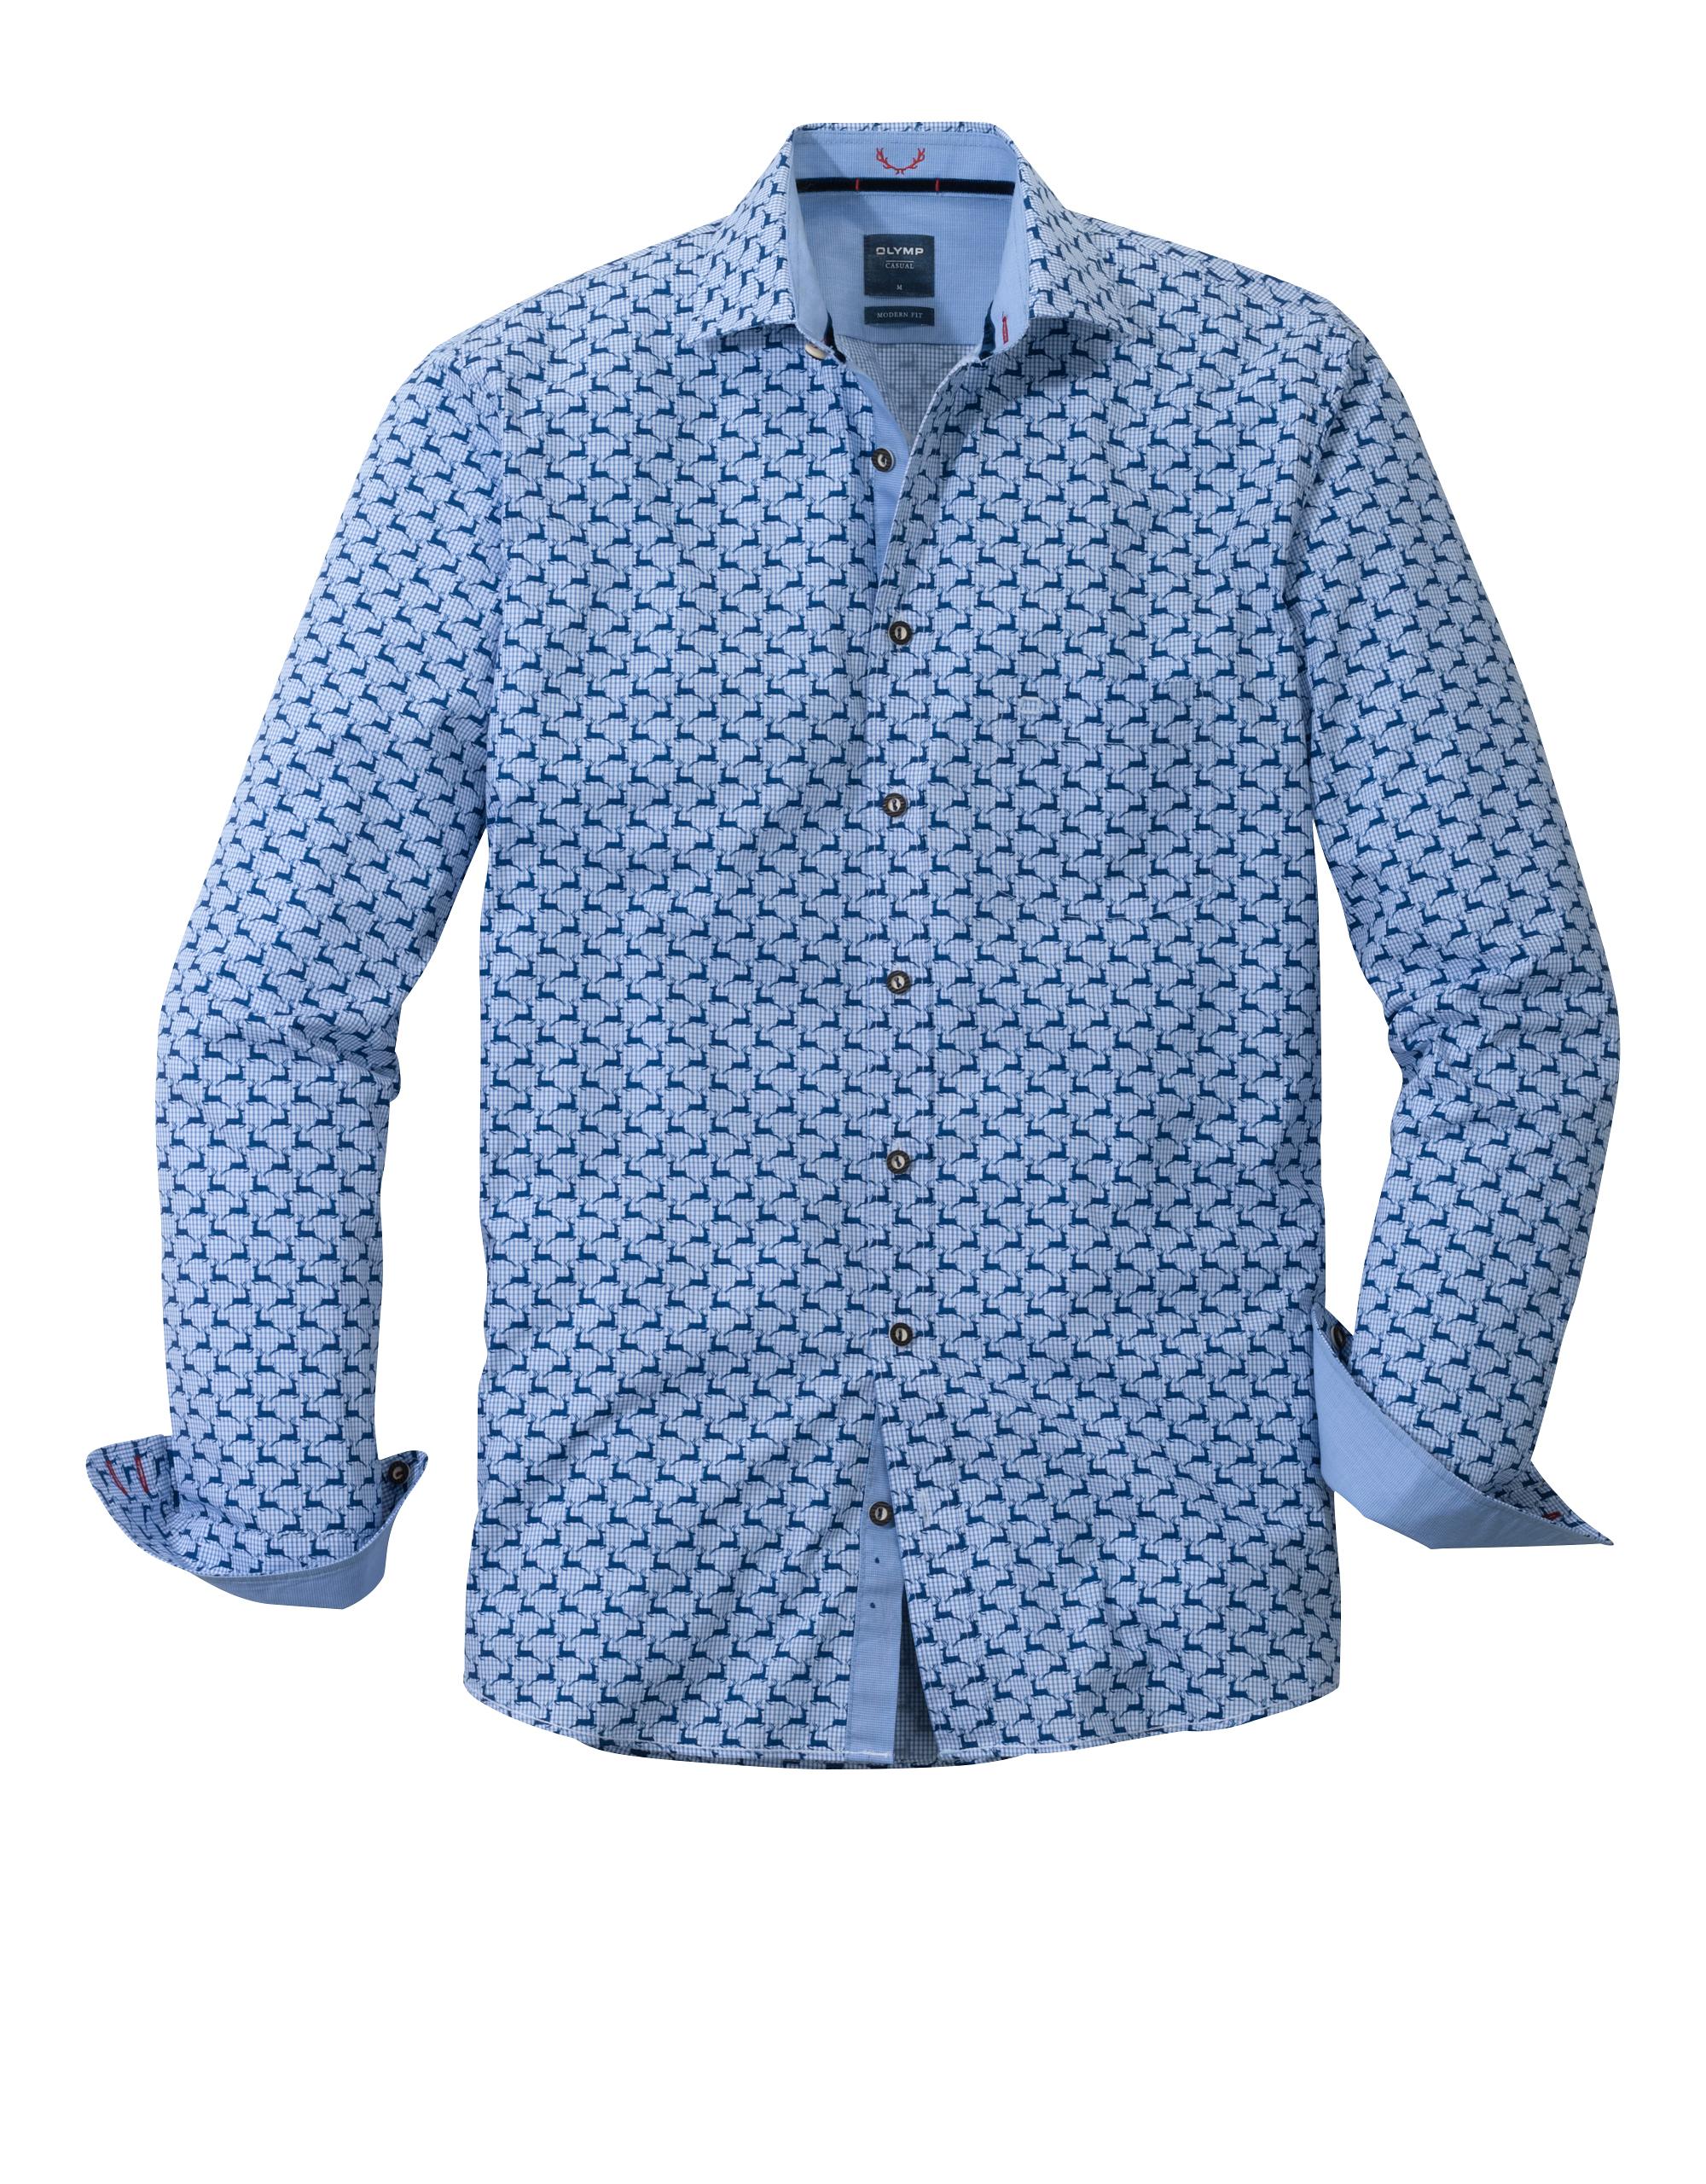 OLYMP Trachtenhemd, modern fit, Kent, Blau, XL   Bekleidung > Hemden > Trachtenhemden   Blau   Baumwolle   OLYMP